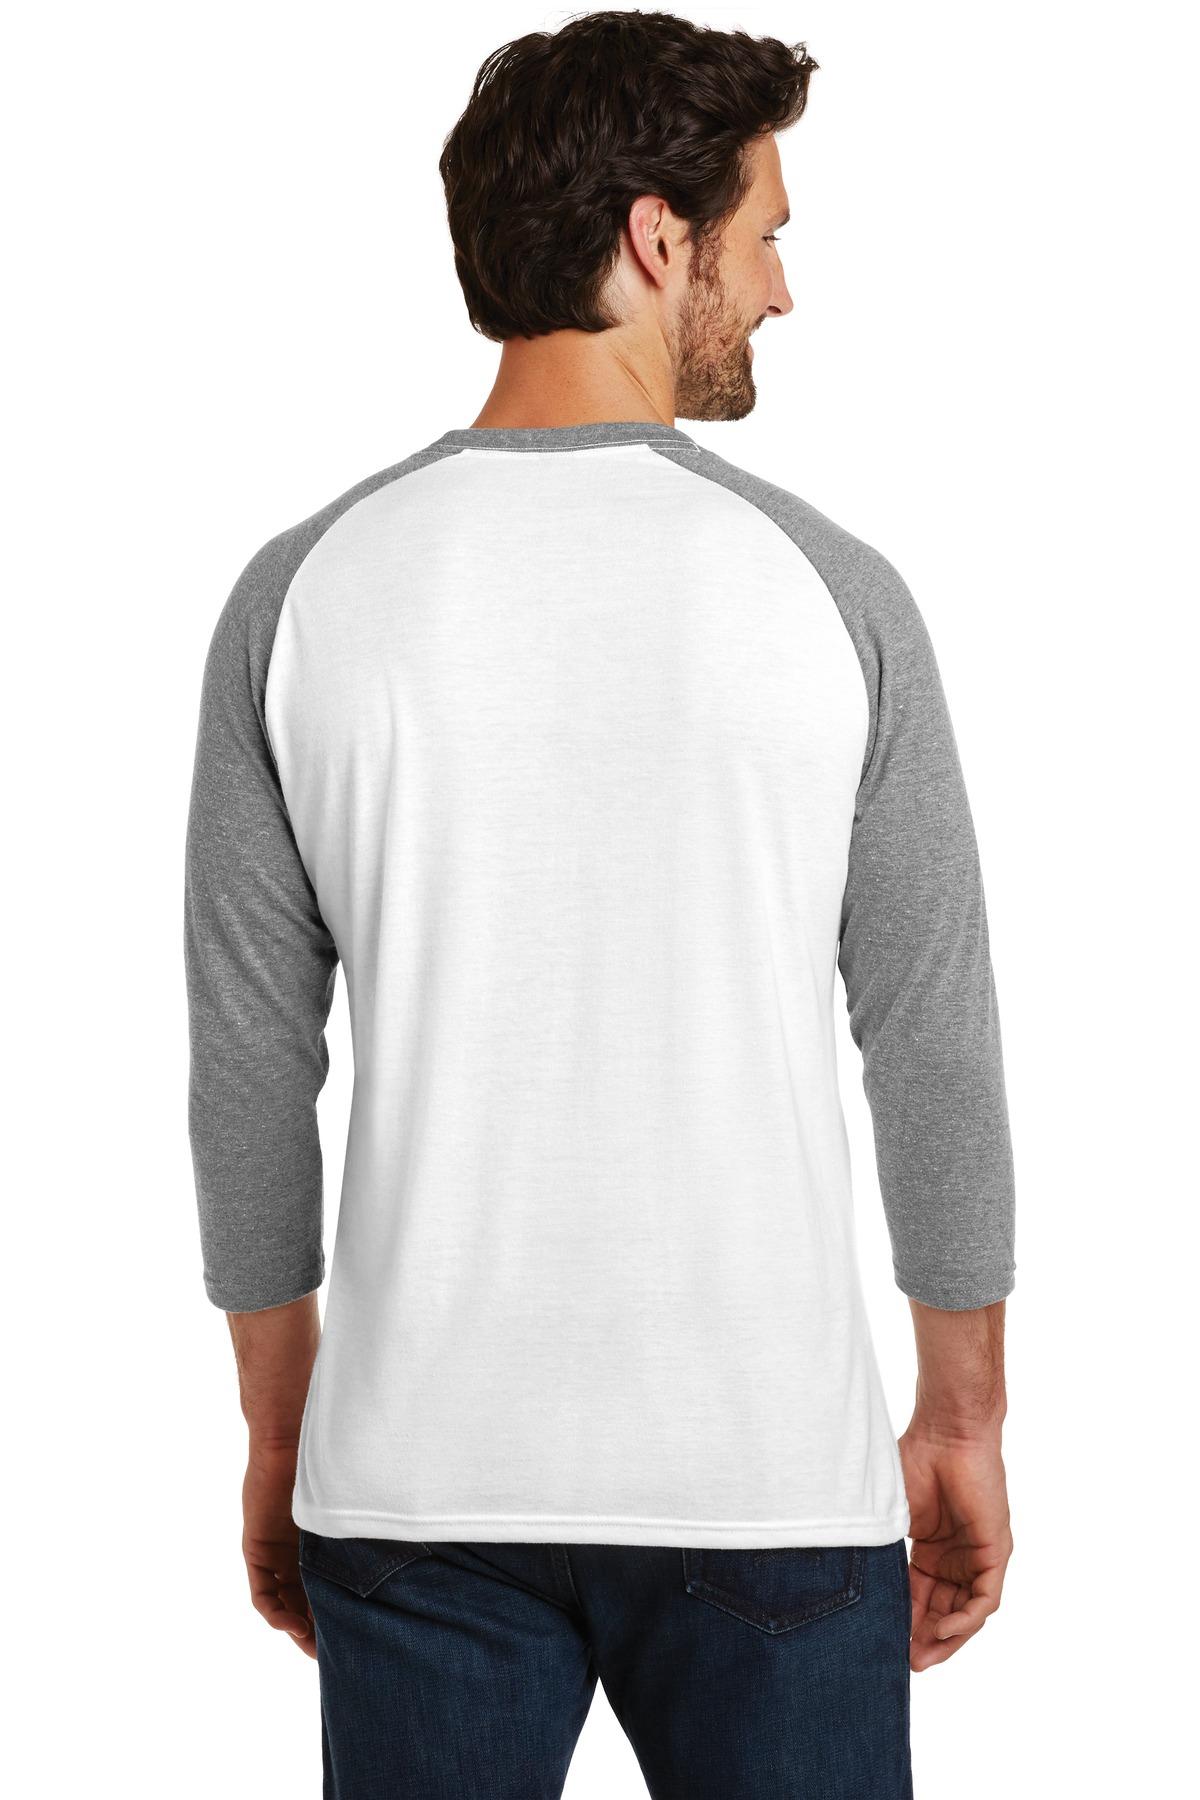 DM greyfrostwhite model back